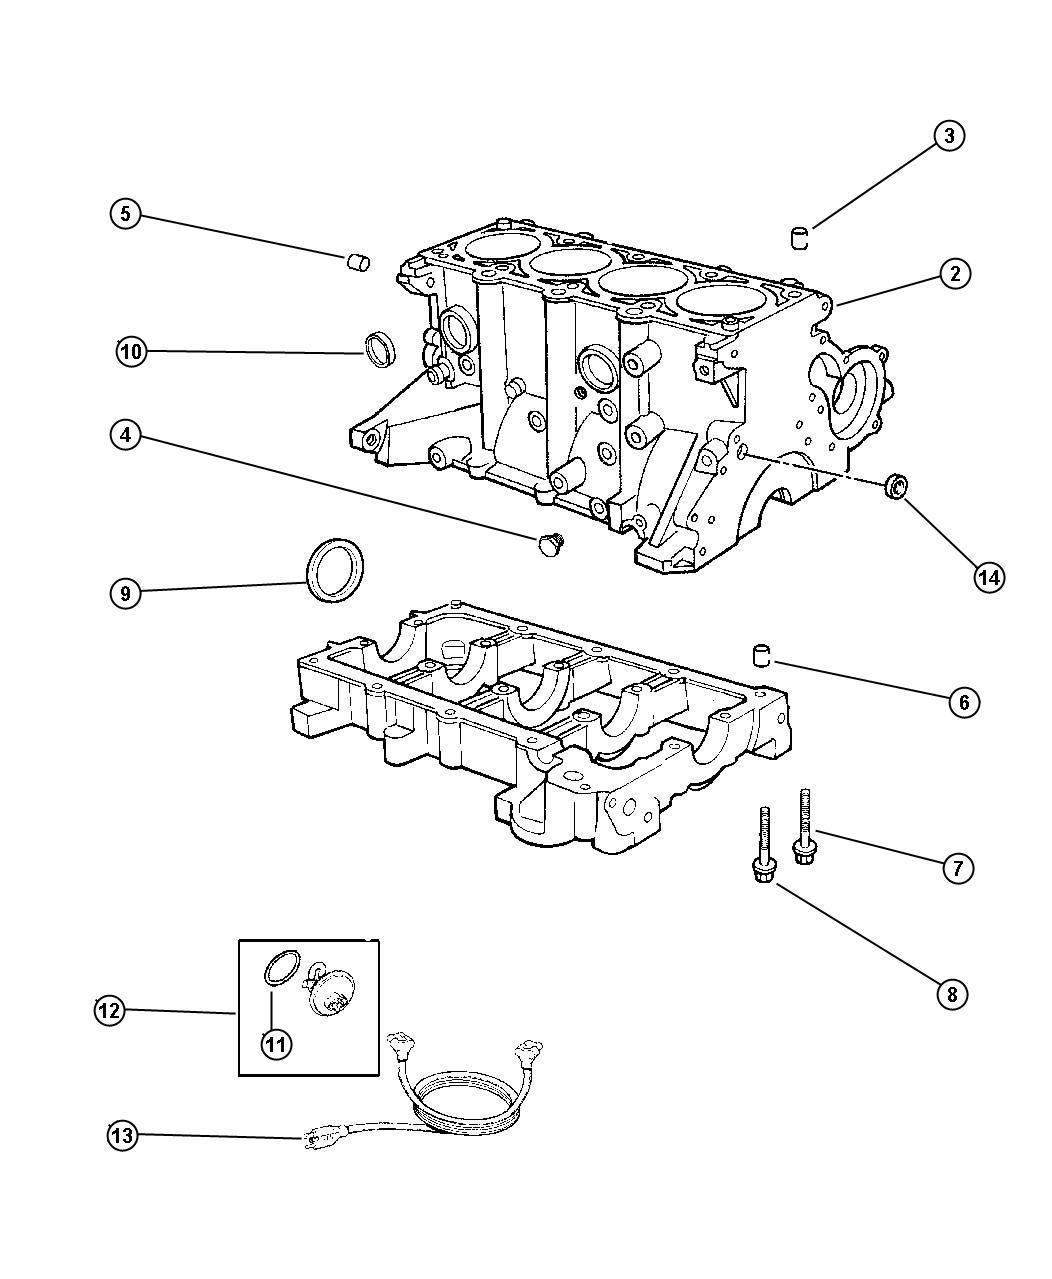 Chrysler Sebring Block. Short. Edz, dohc, cylinder